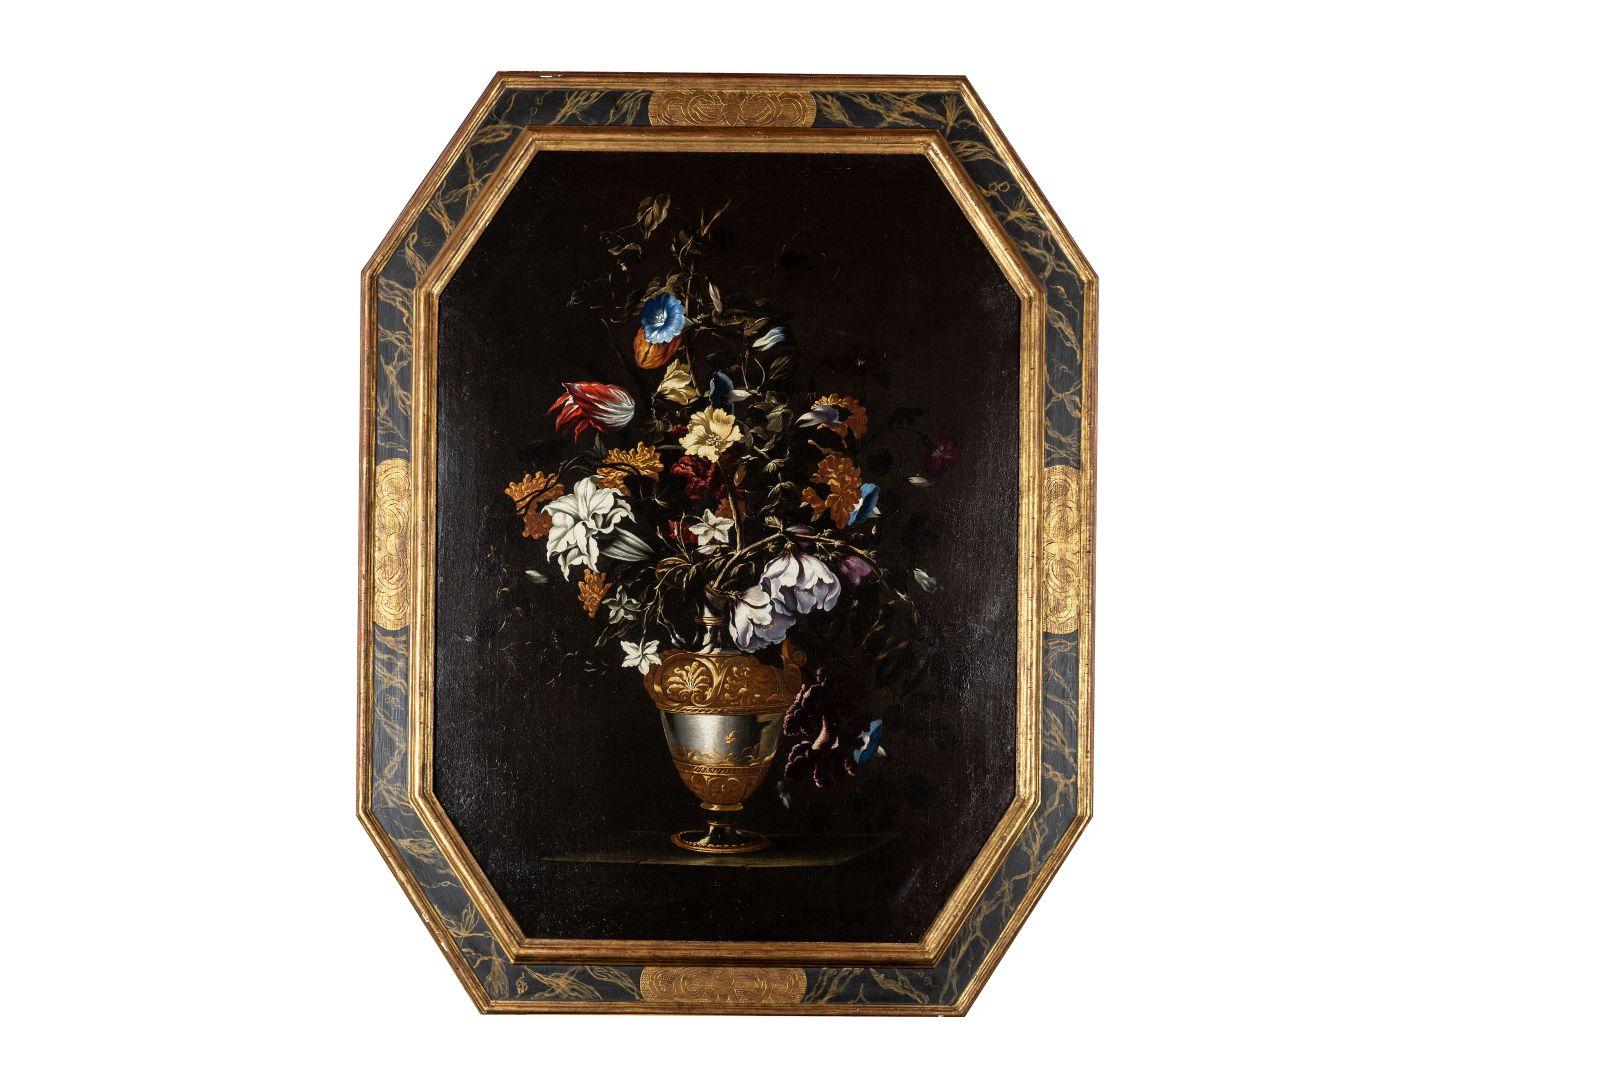 "#25 Mario Nuzzi, ""Flower still life"", oil, 17th century|Mario Nuzzi, ""Blumenstillleben"", Öl, 17. Jahrhundert Image"